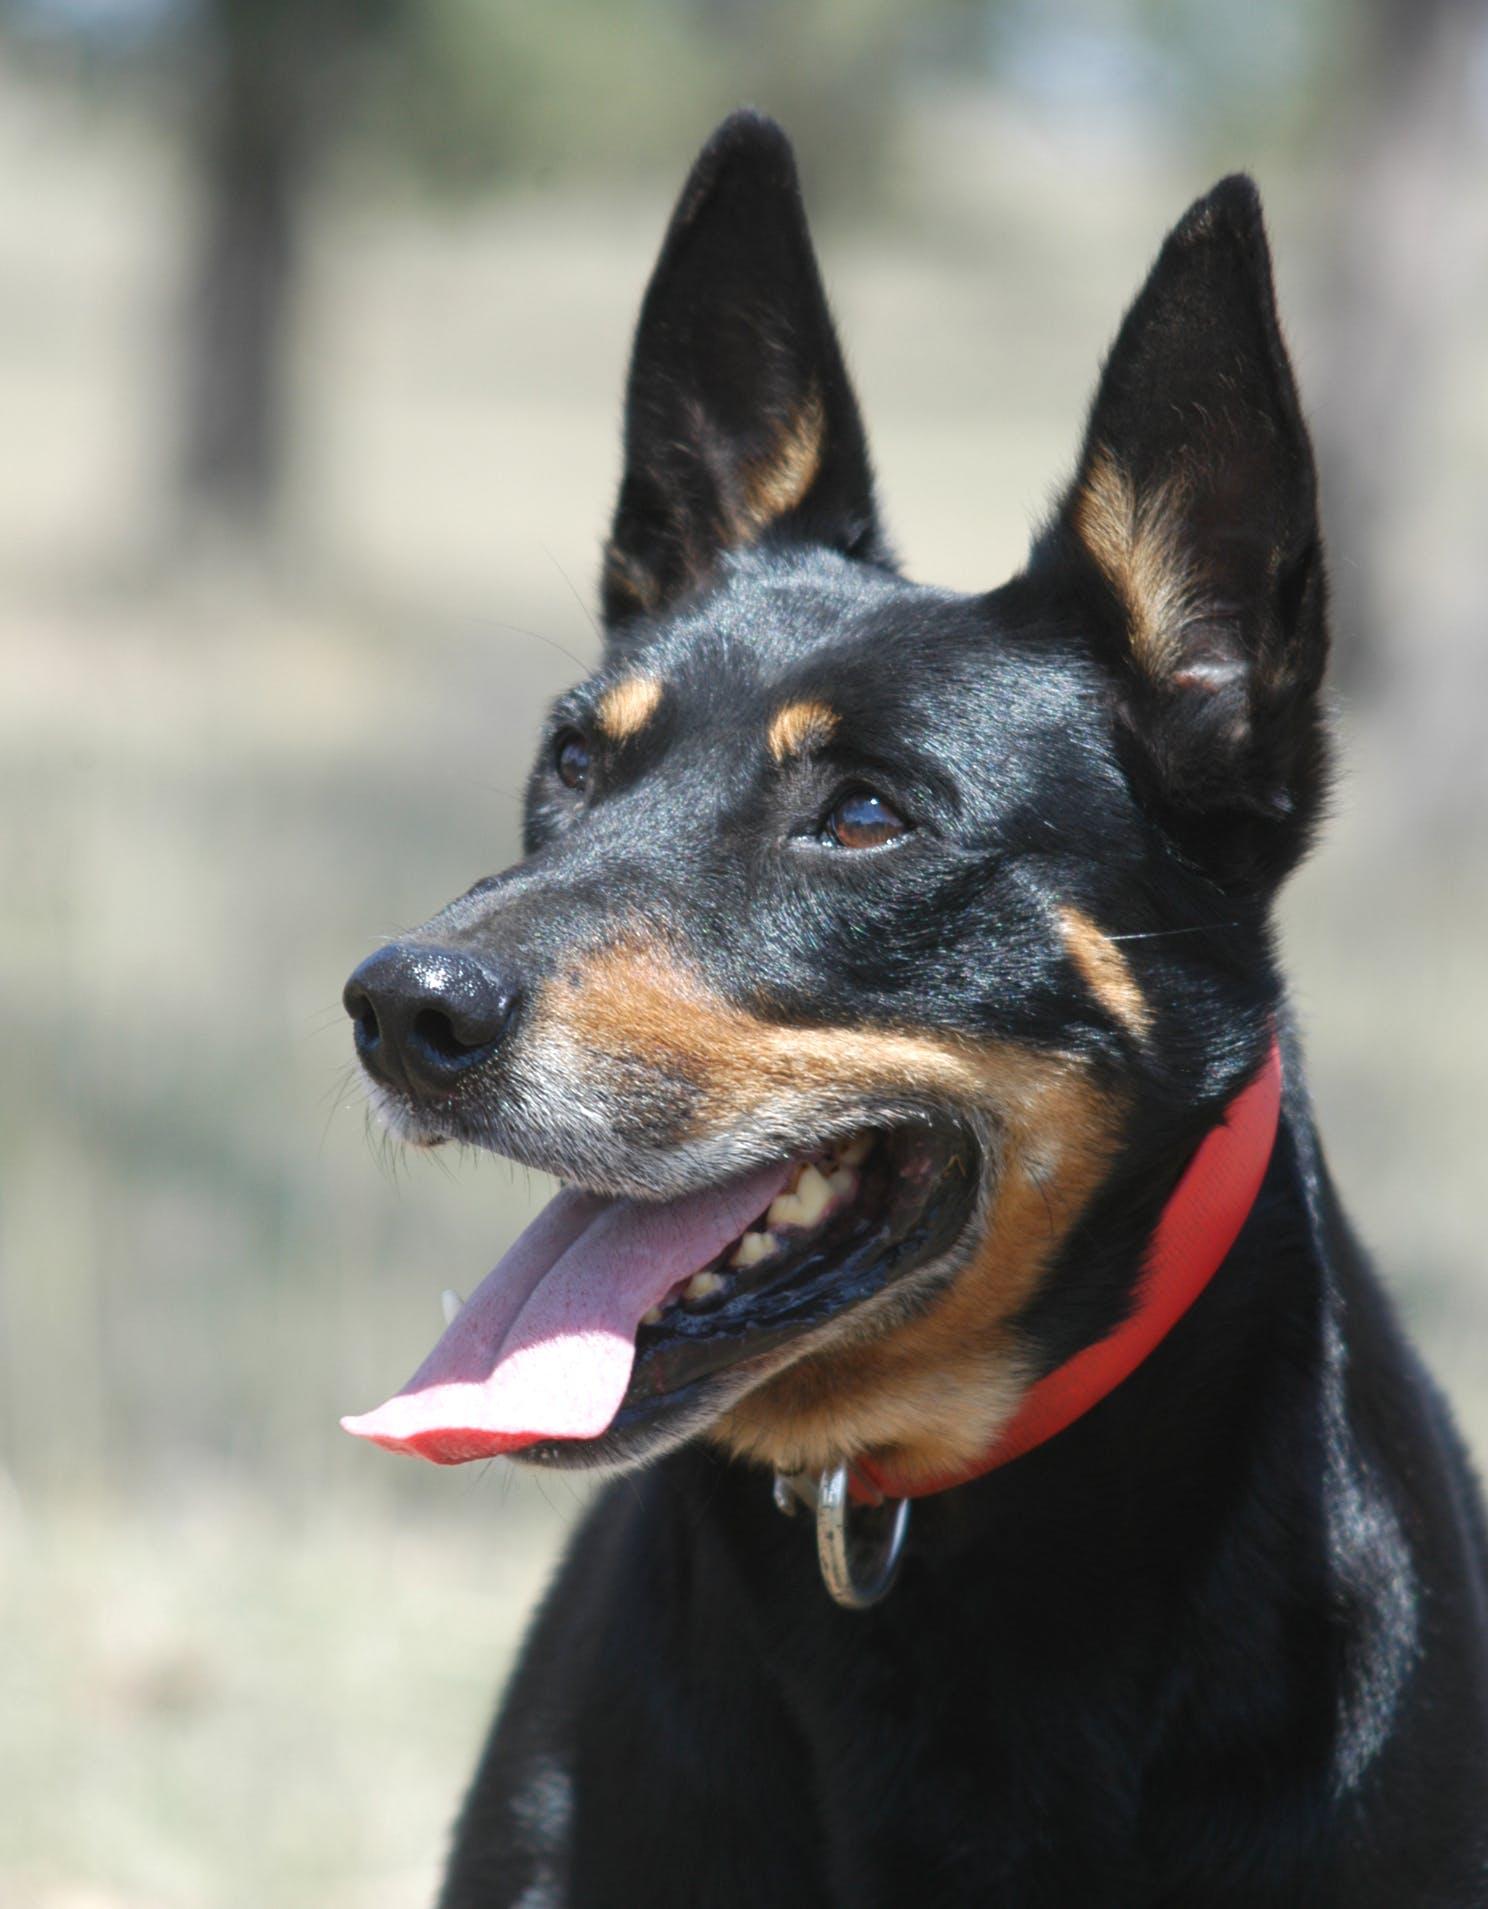 Feb+07+Kelpie+dog+with+ears+up